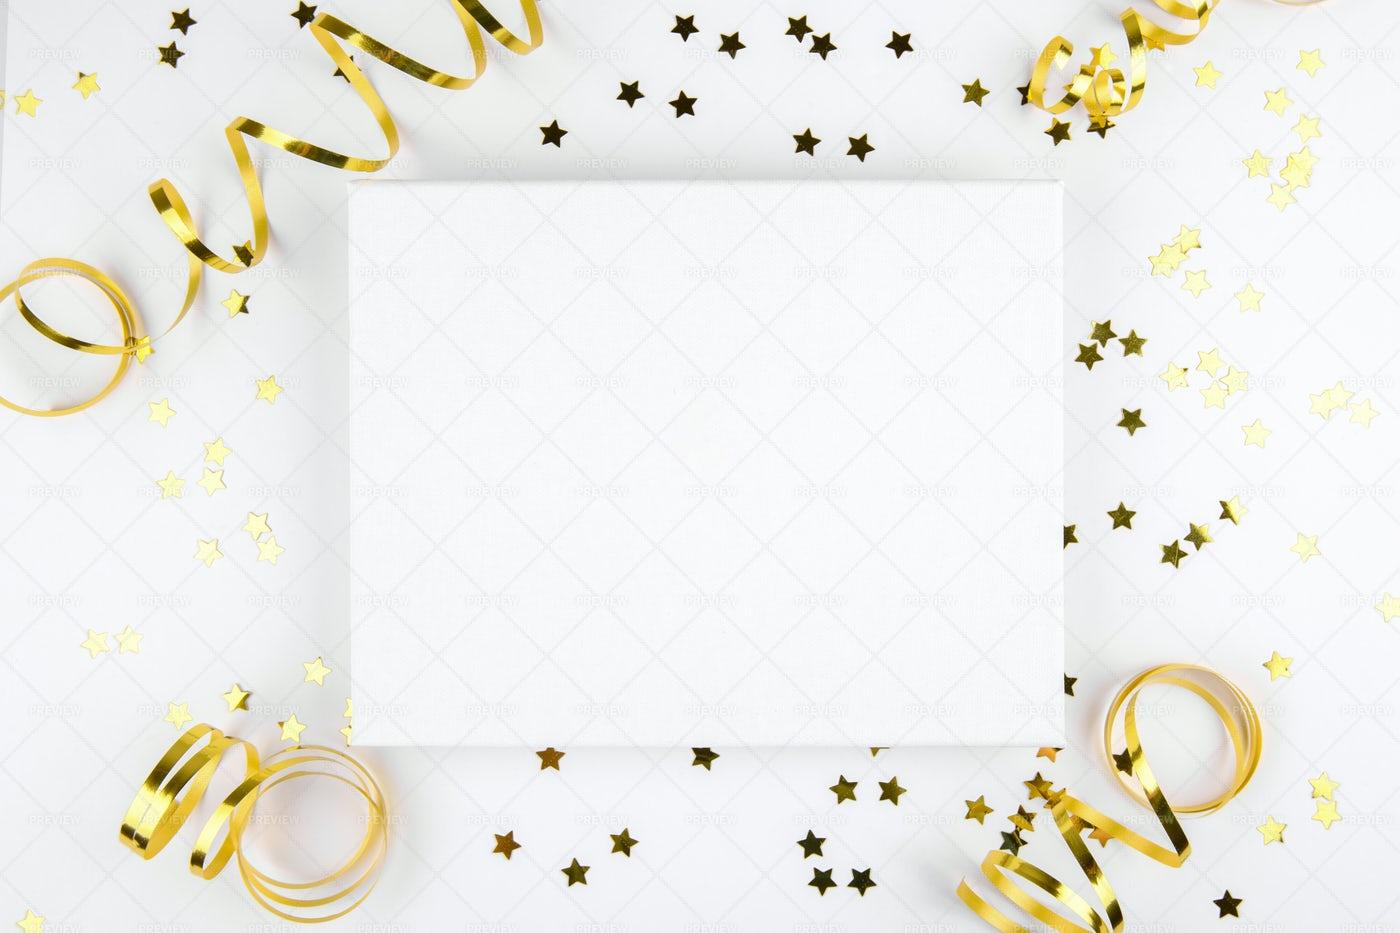 Christmas Canvas With Decoration: Stock Photos